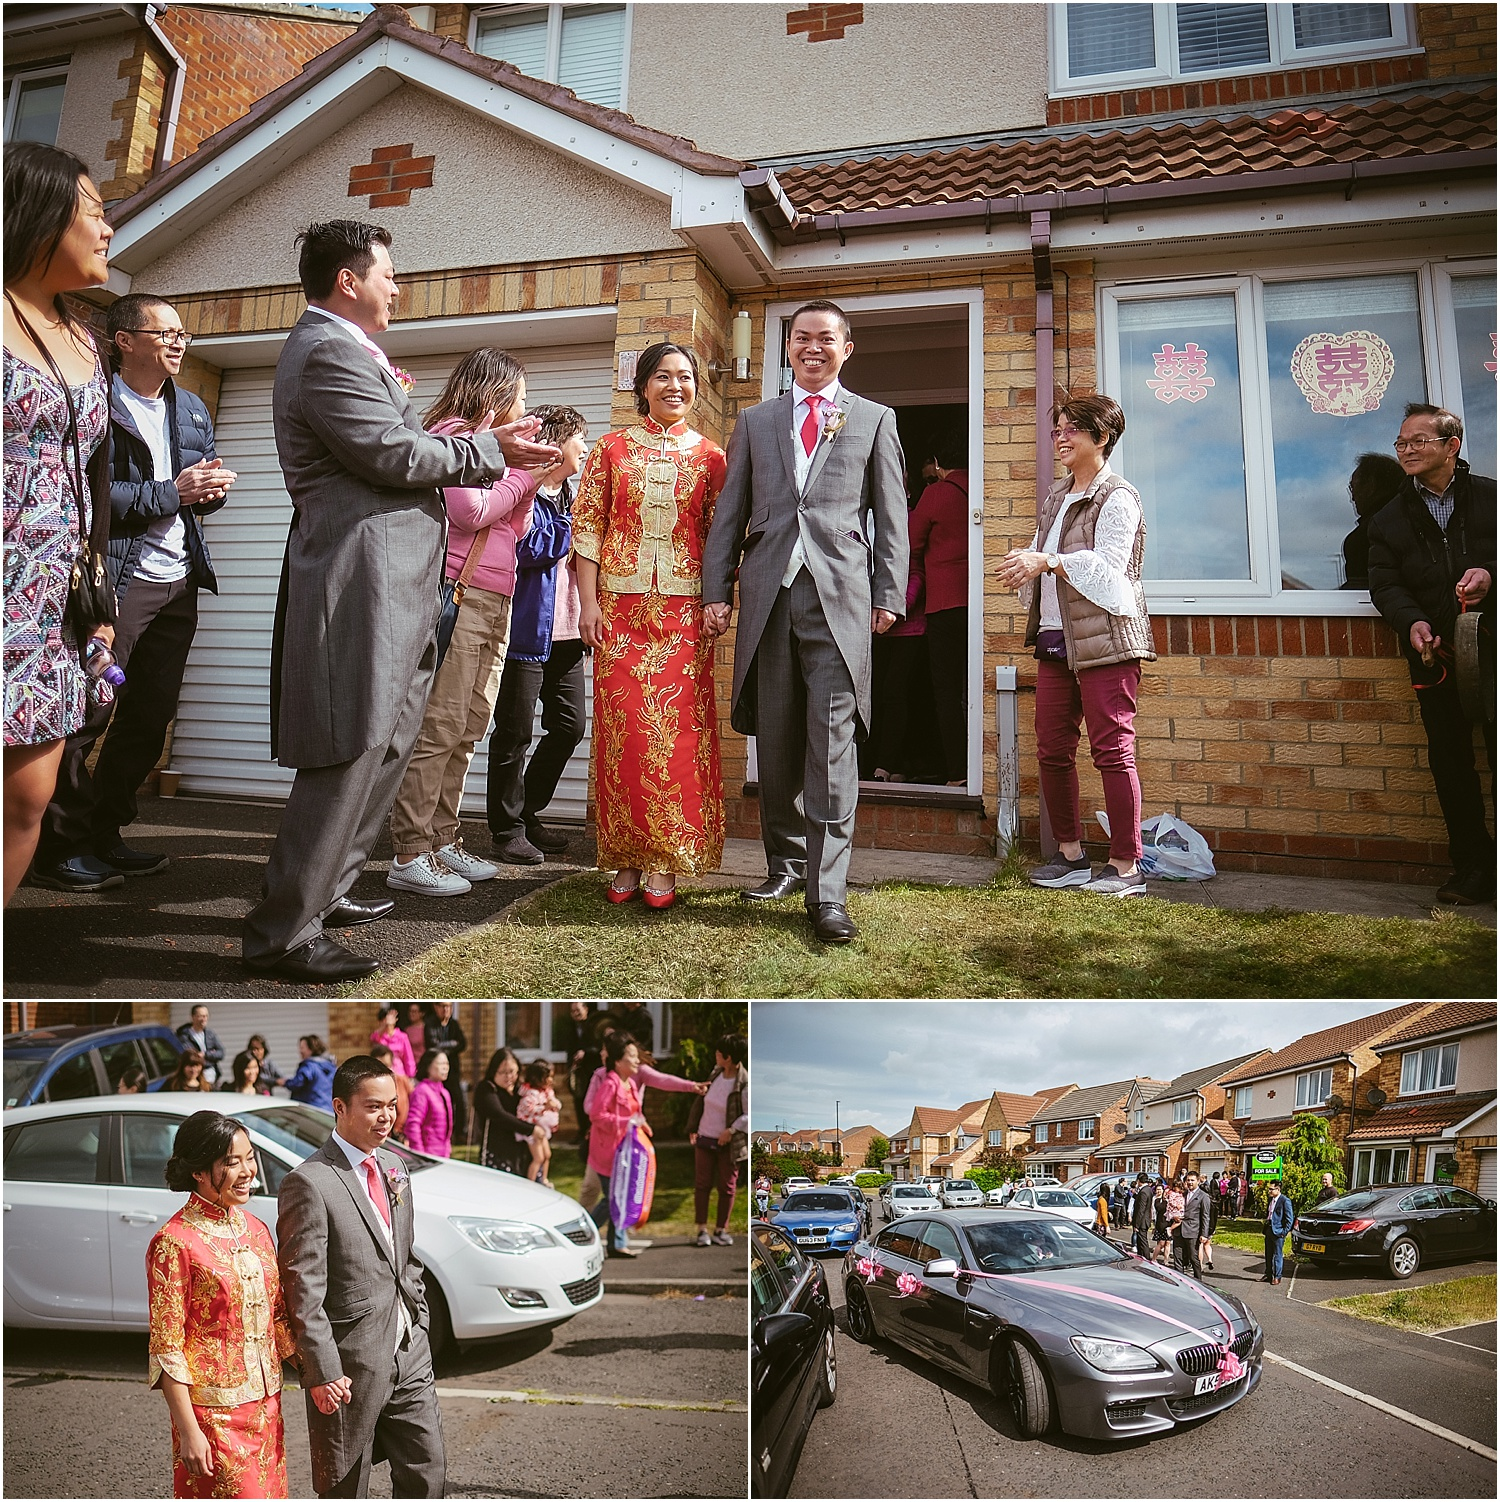 Matfen Hall wedding photography photography by www.2tonephotography.co.uk 013.jpg